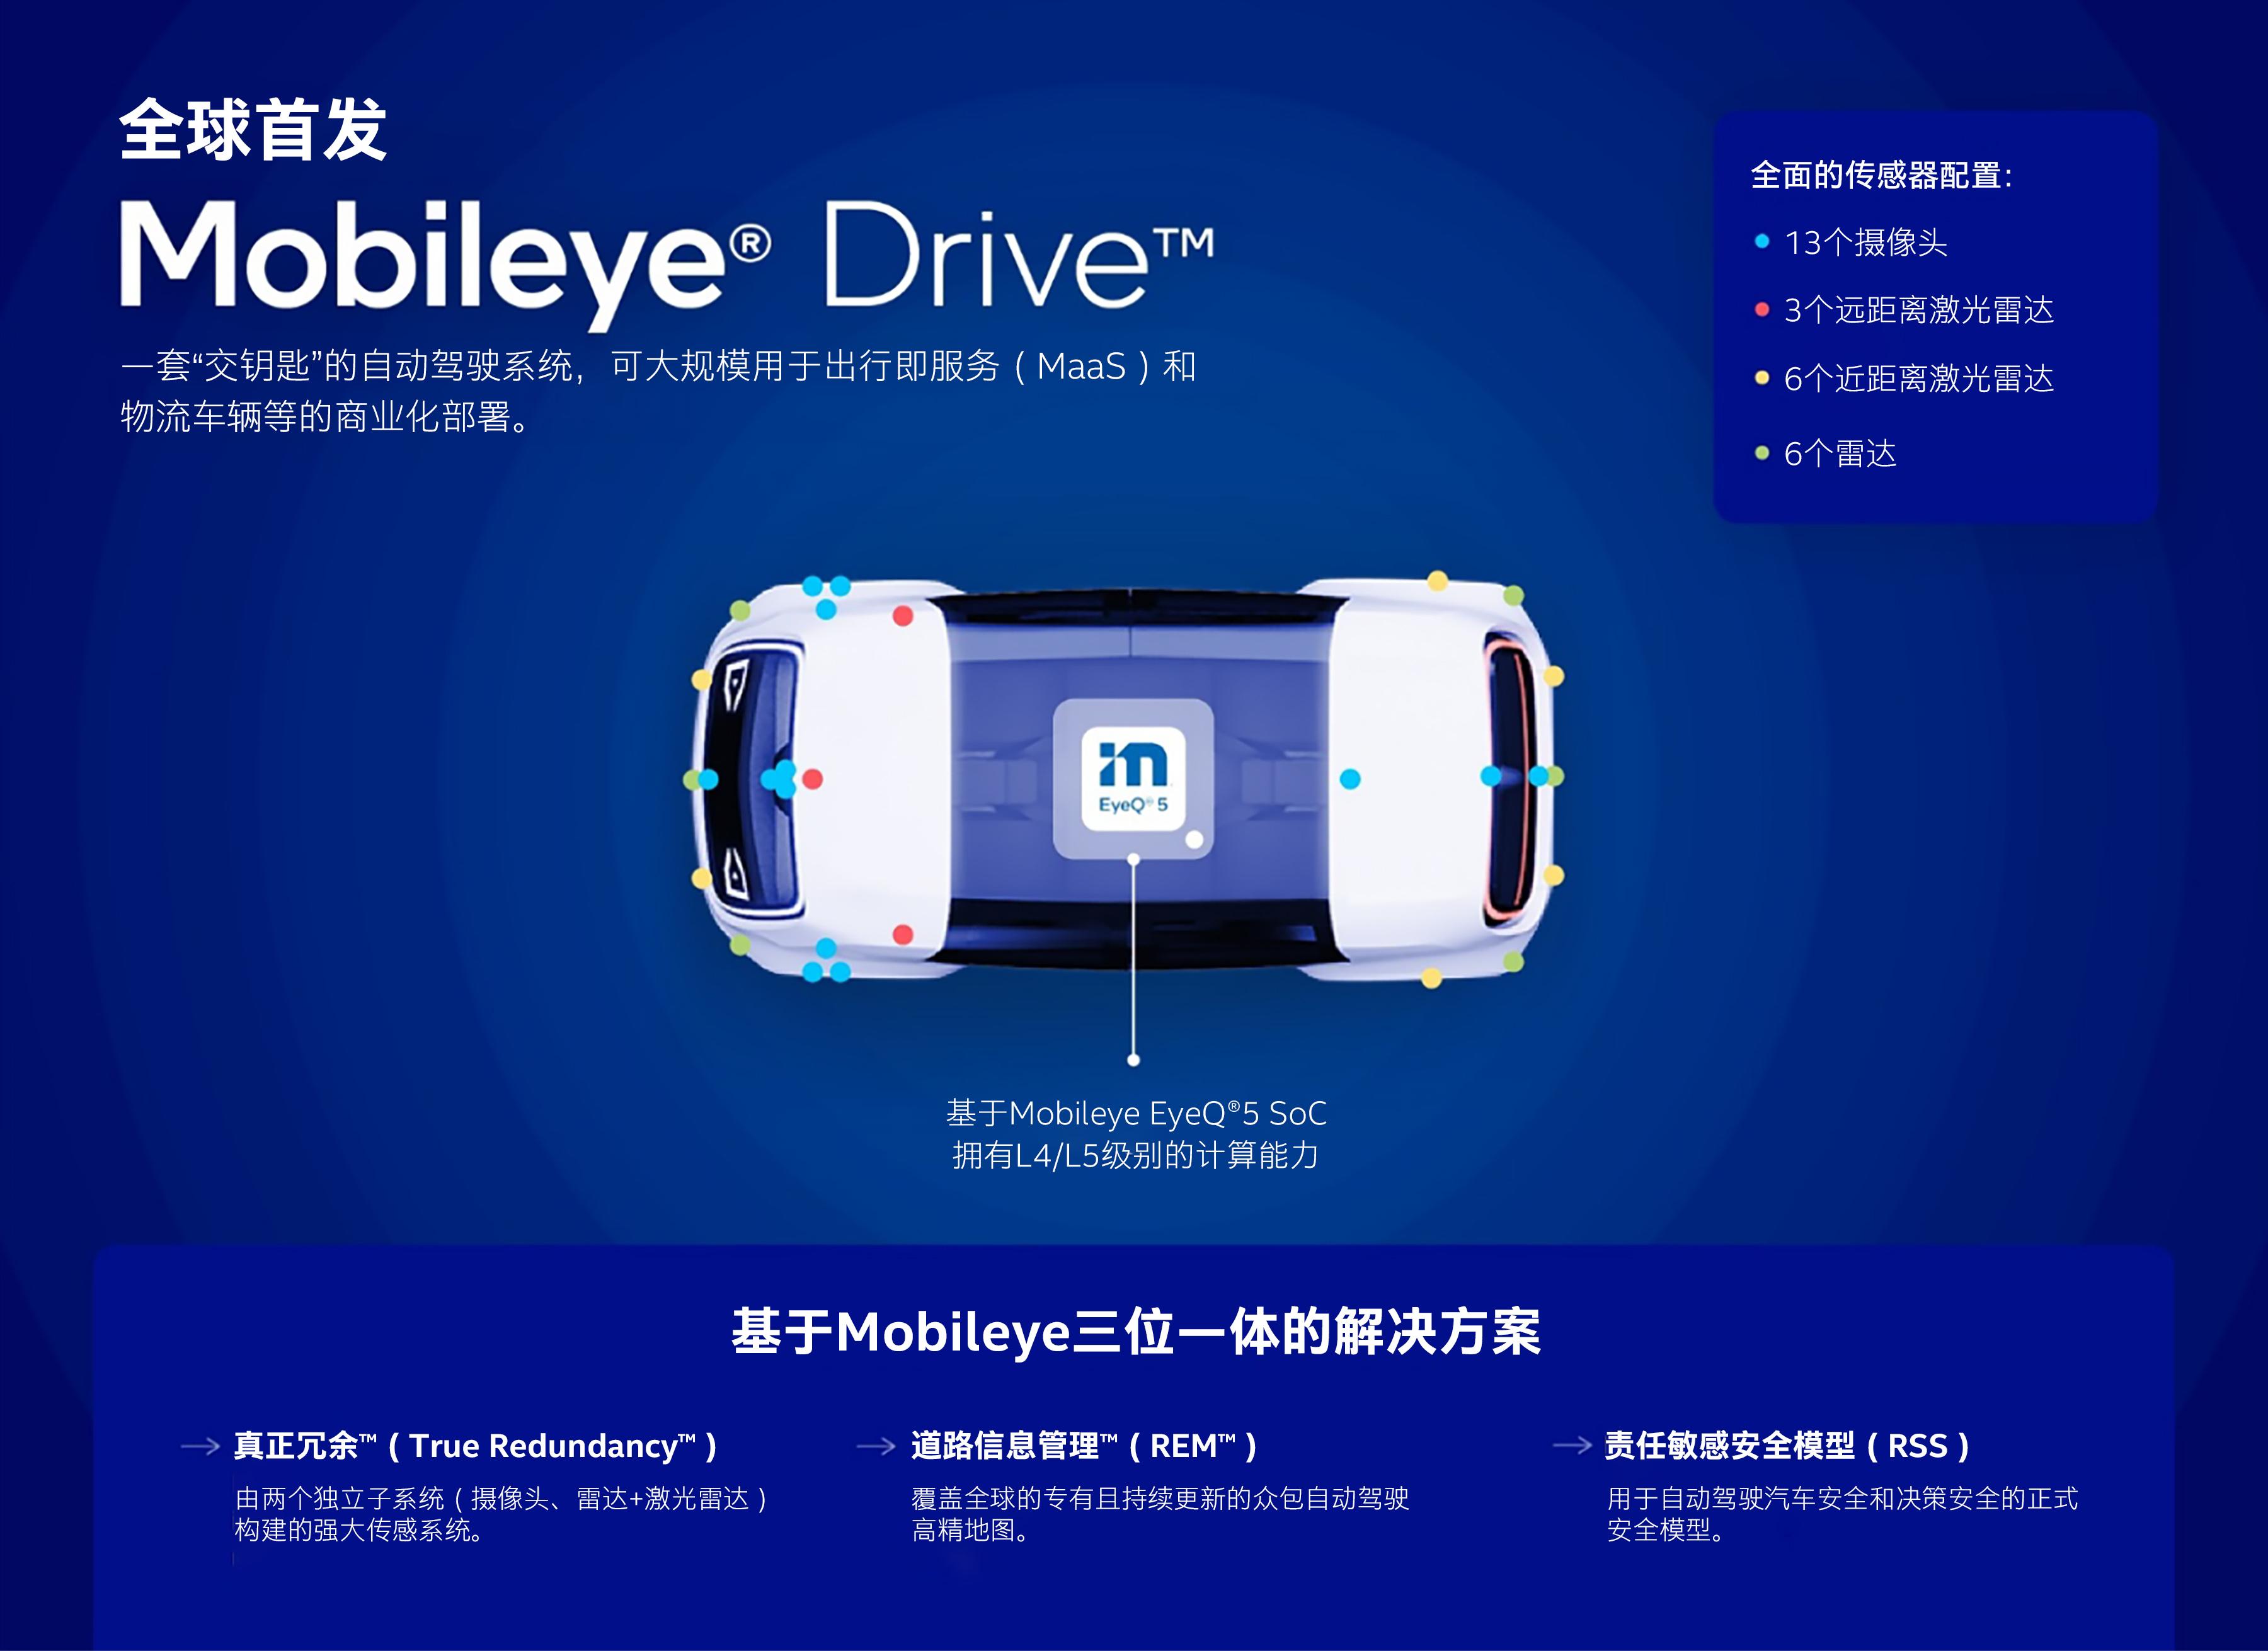 Mobileye推出L4自动驾驶解决方案,Mobileye Drive™现已为MaaS提供商用